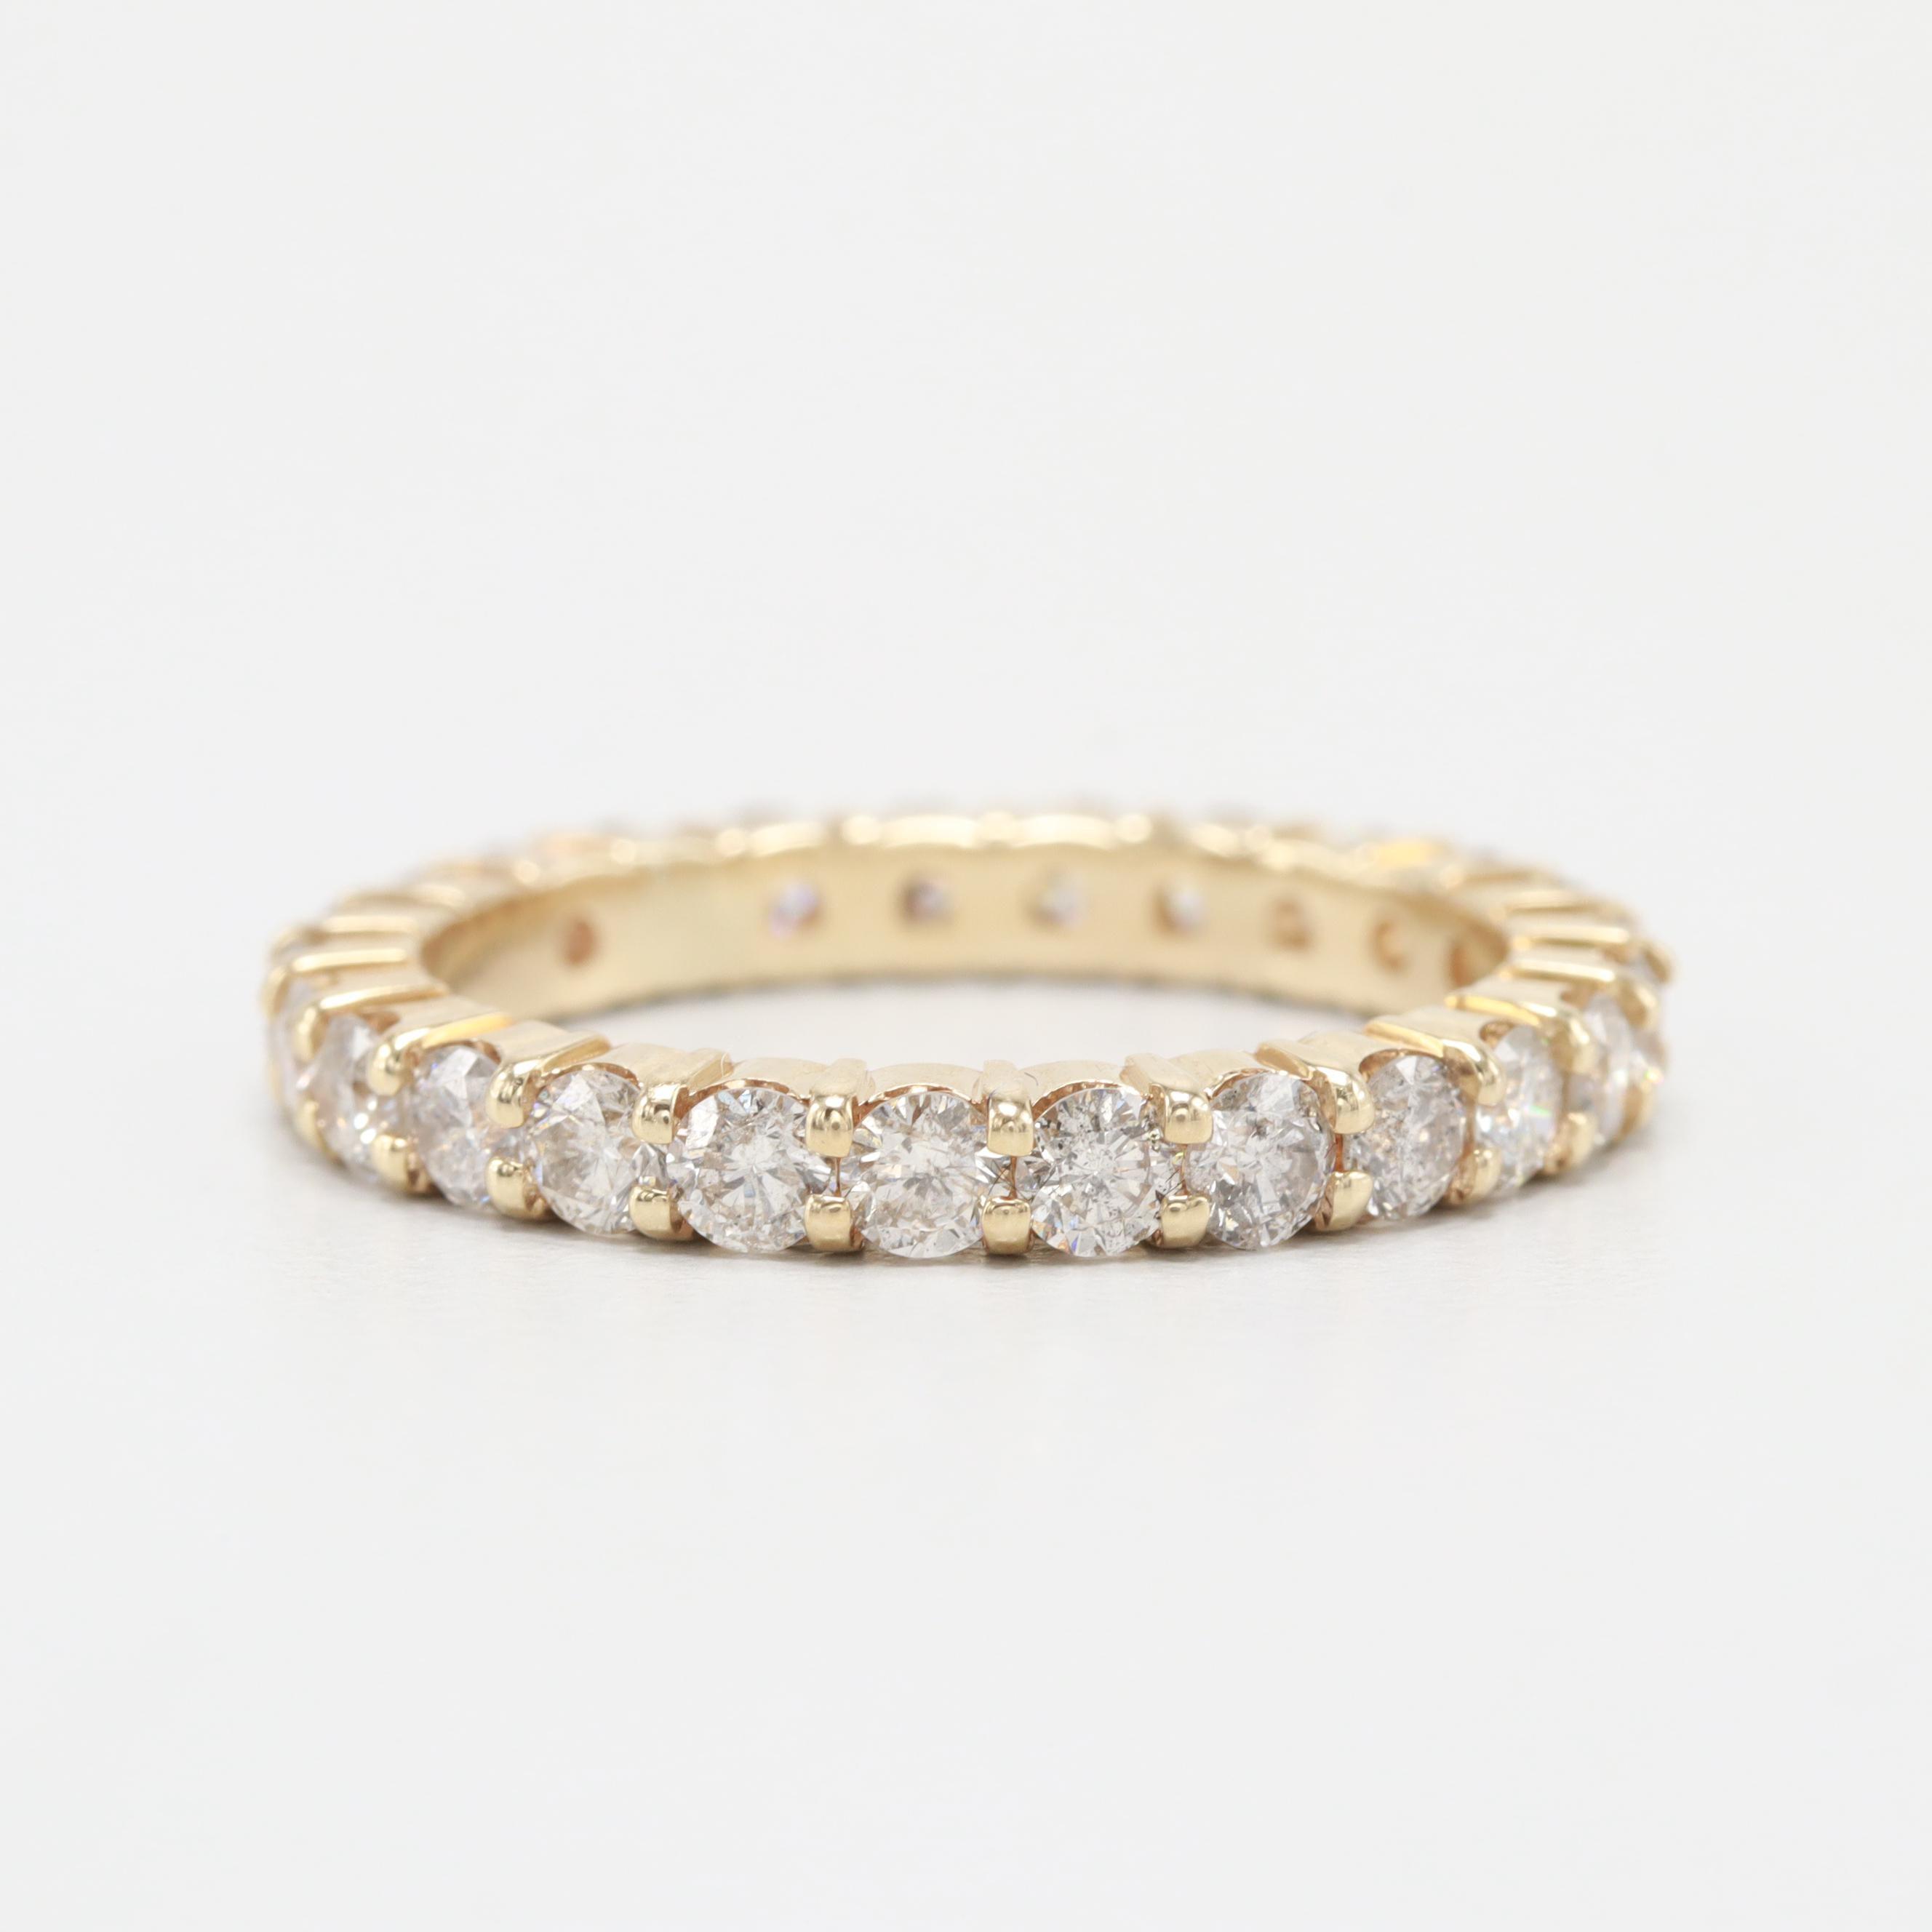 14K Yellow Gold 1.75 CTW Diamond Eternity Ring